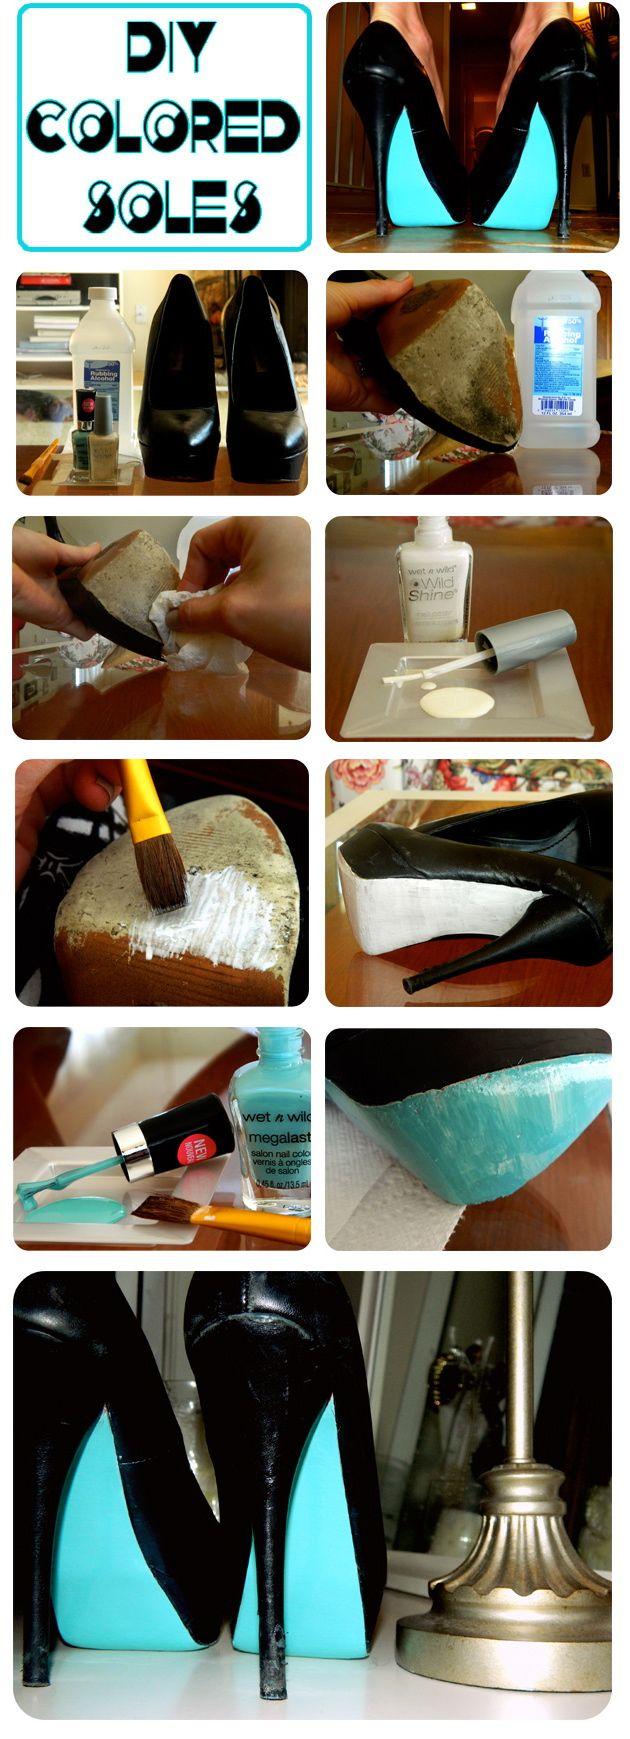 DIY ✄ Colored Soles